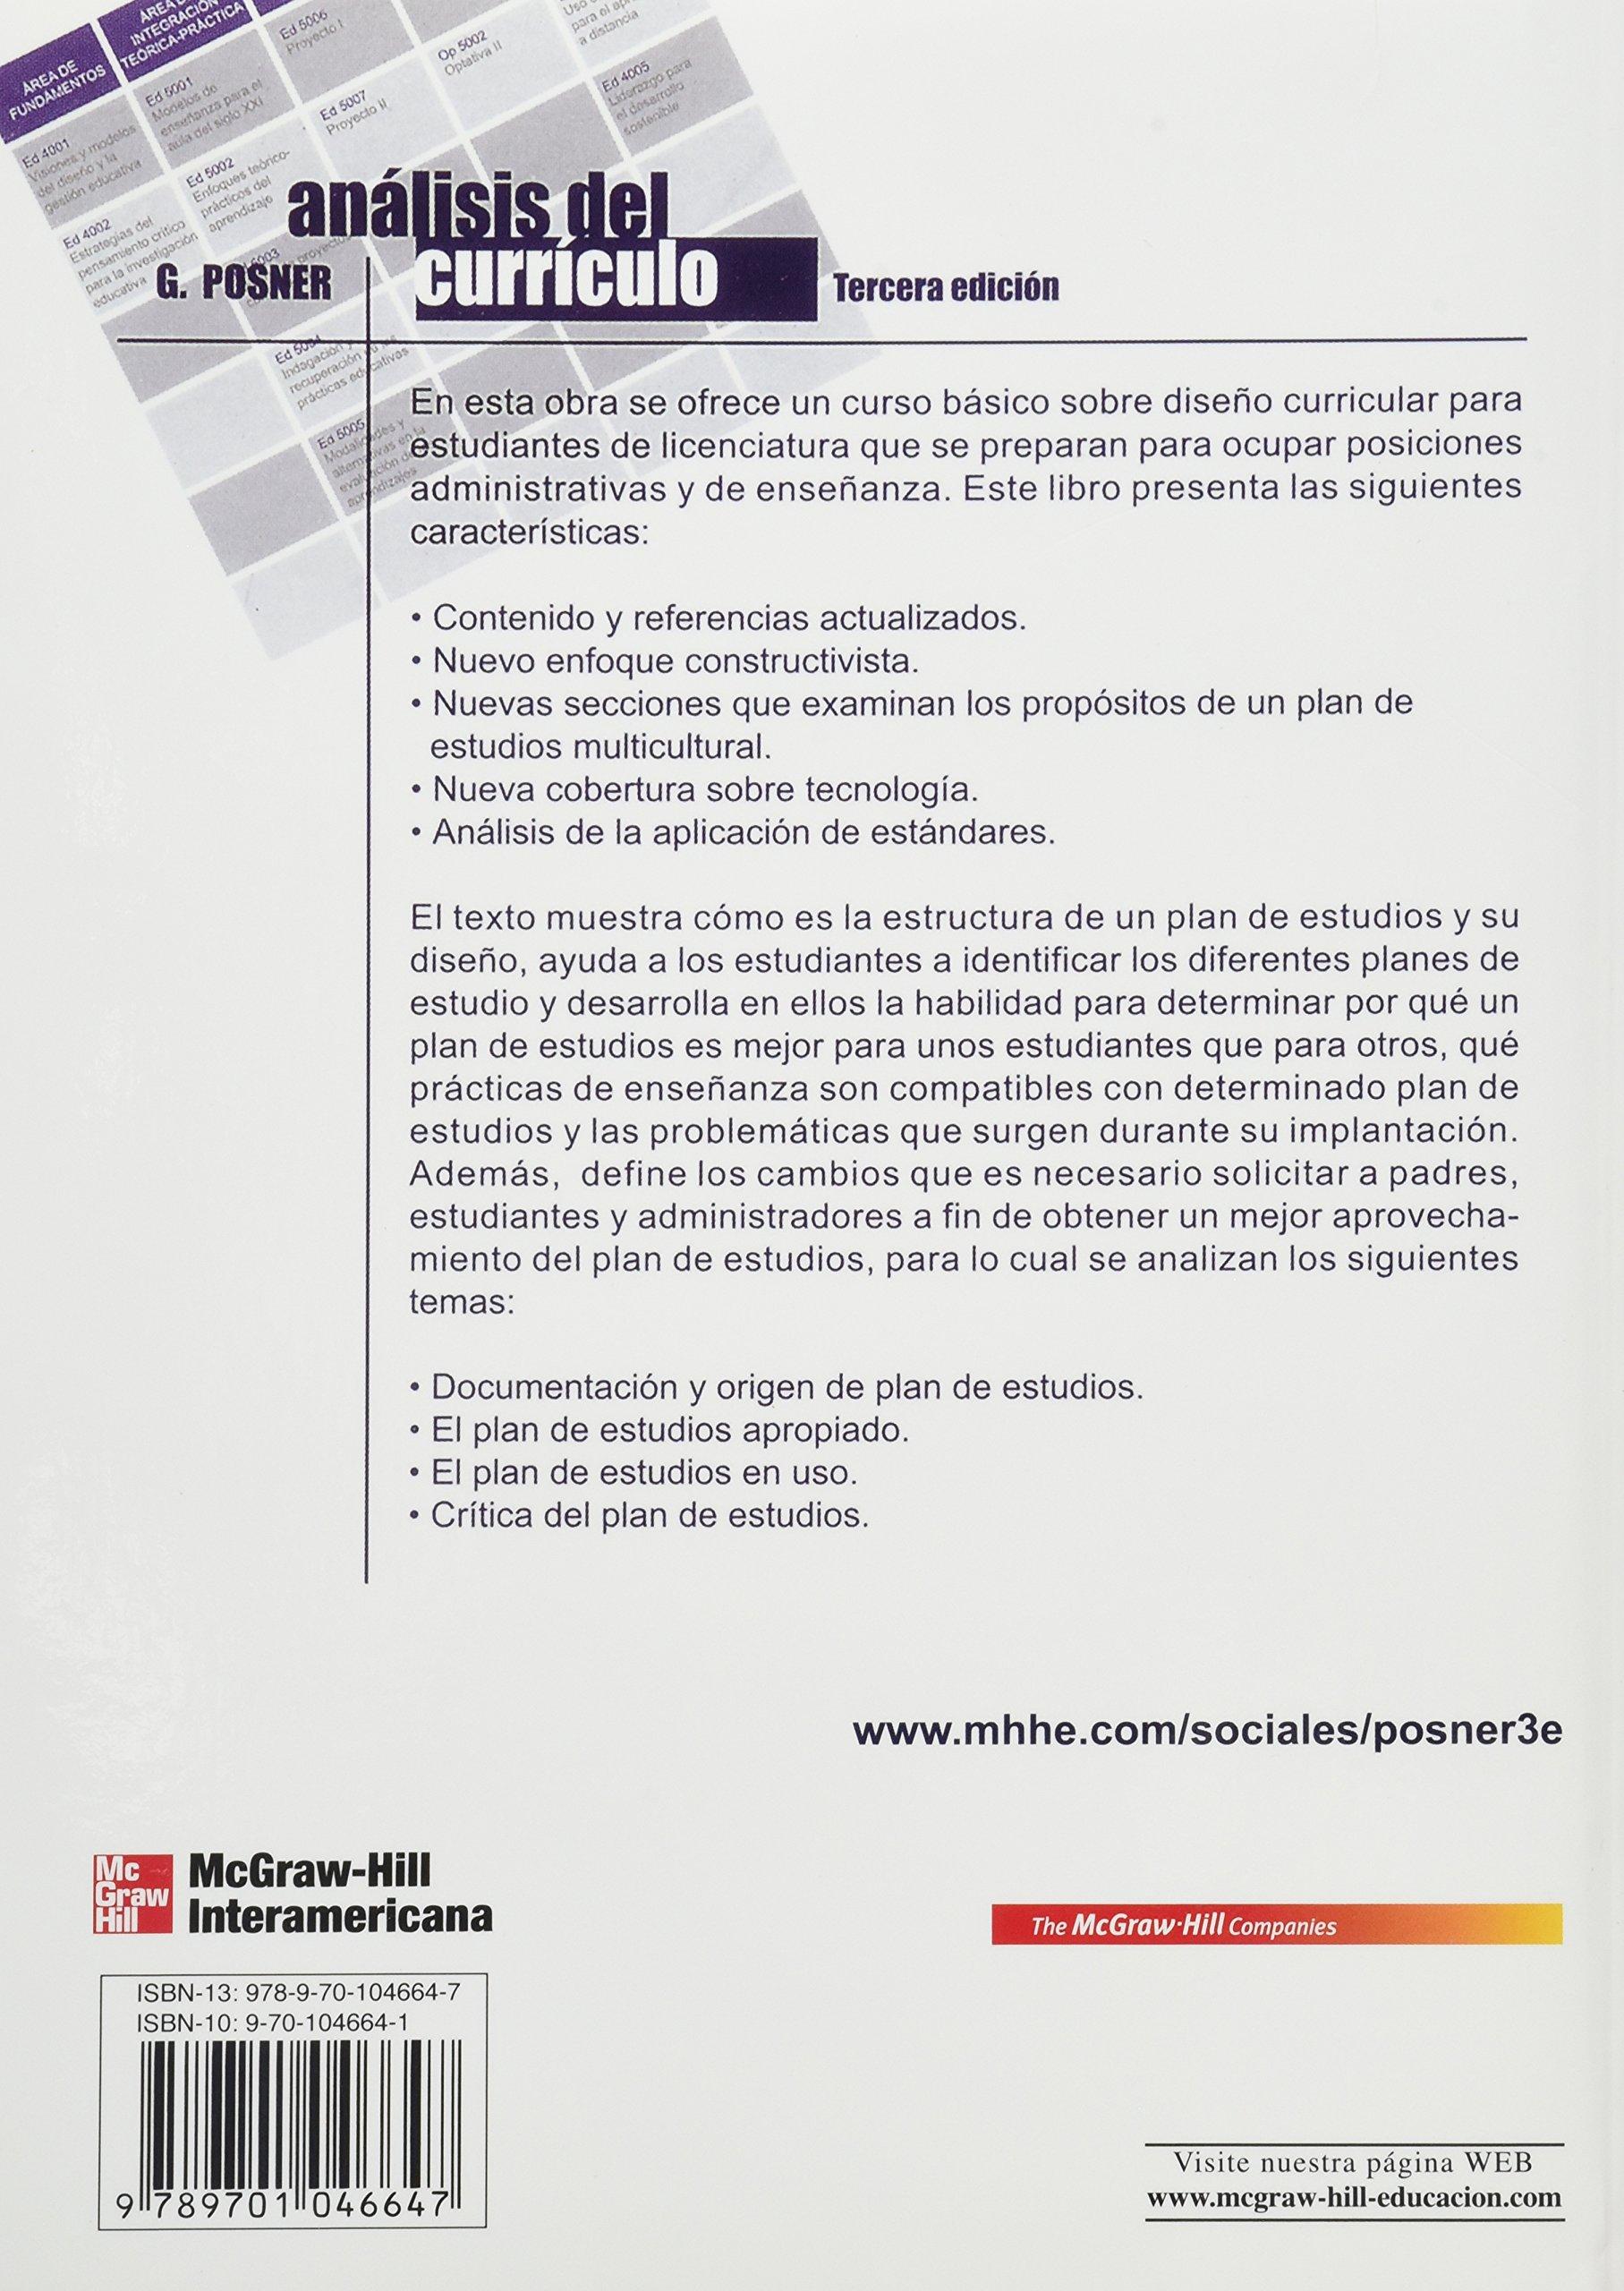 Analisis DeCurriculo: Curriculum Analysis: Amazon.es: George J ...